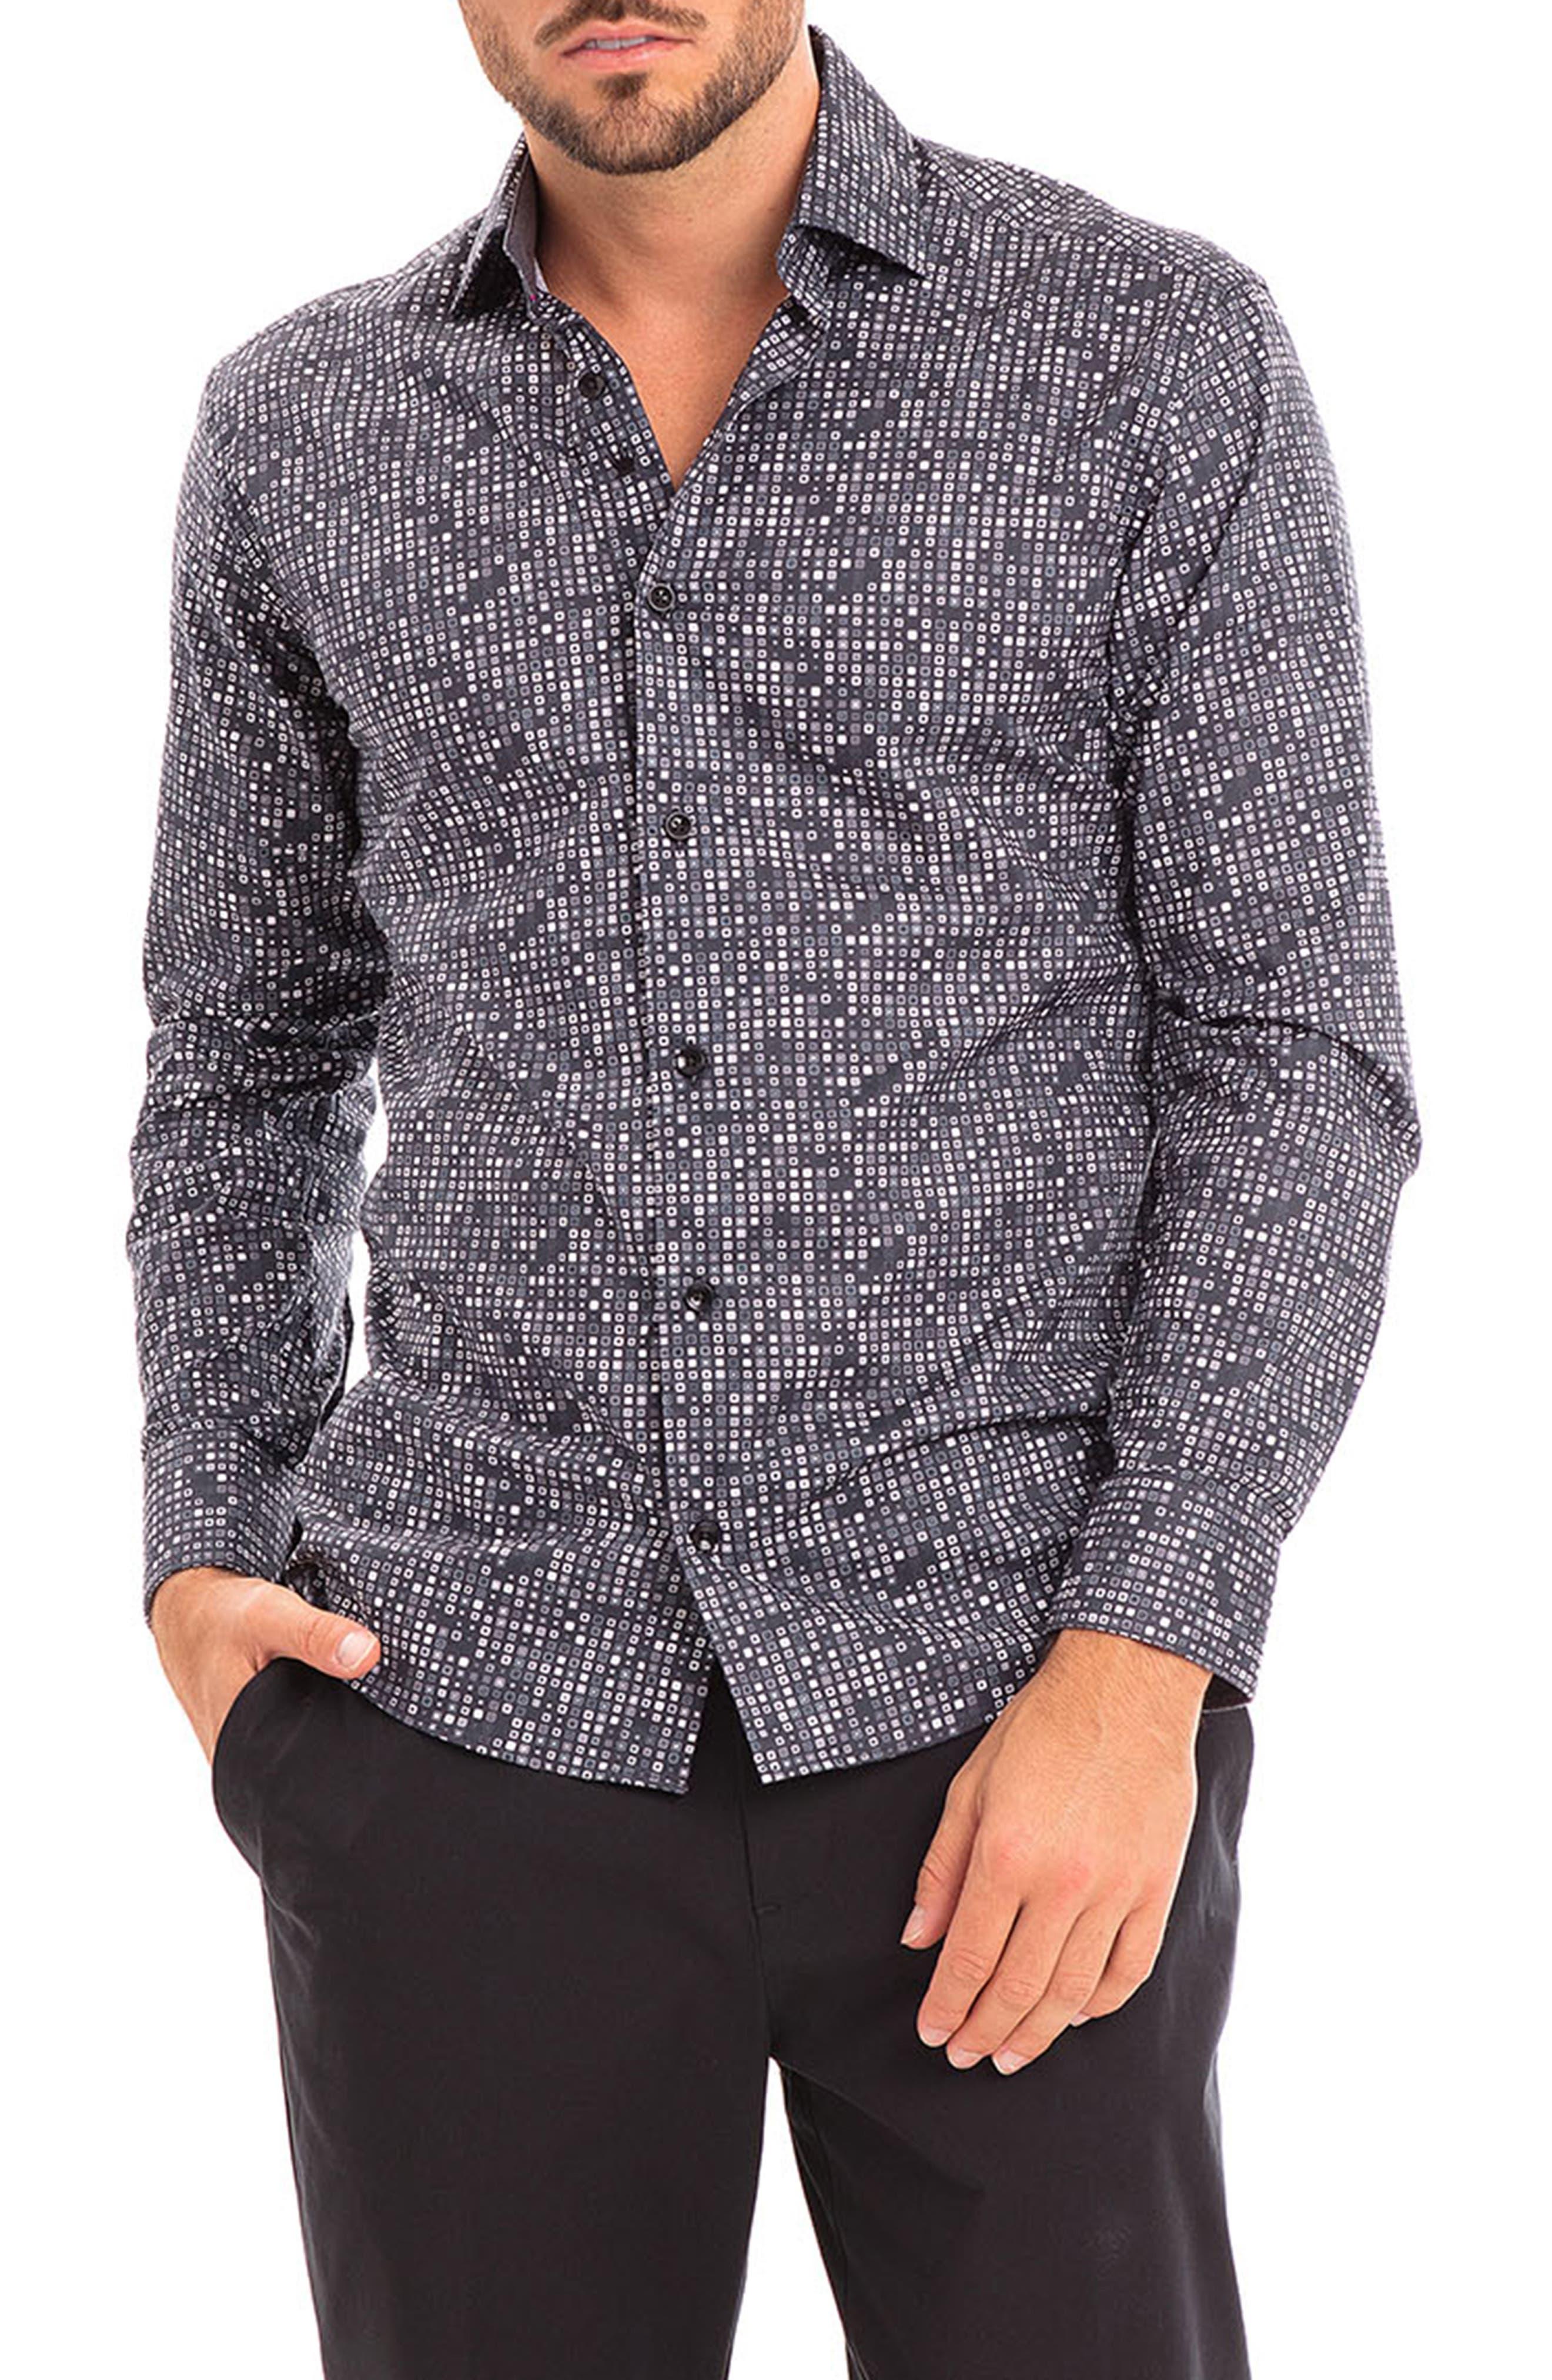 Berezi Dot Print Slim Fit Button-Up Shirt